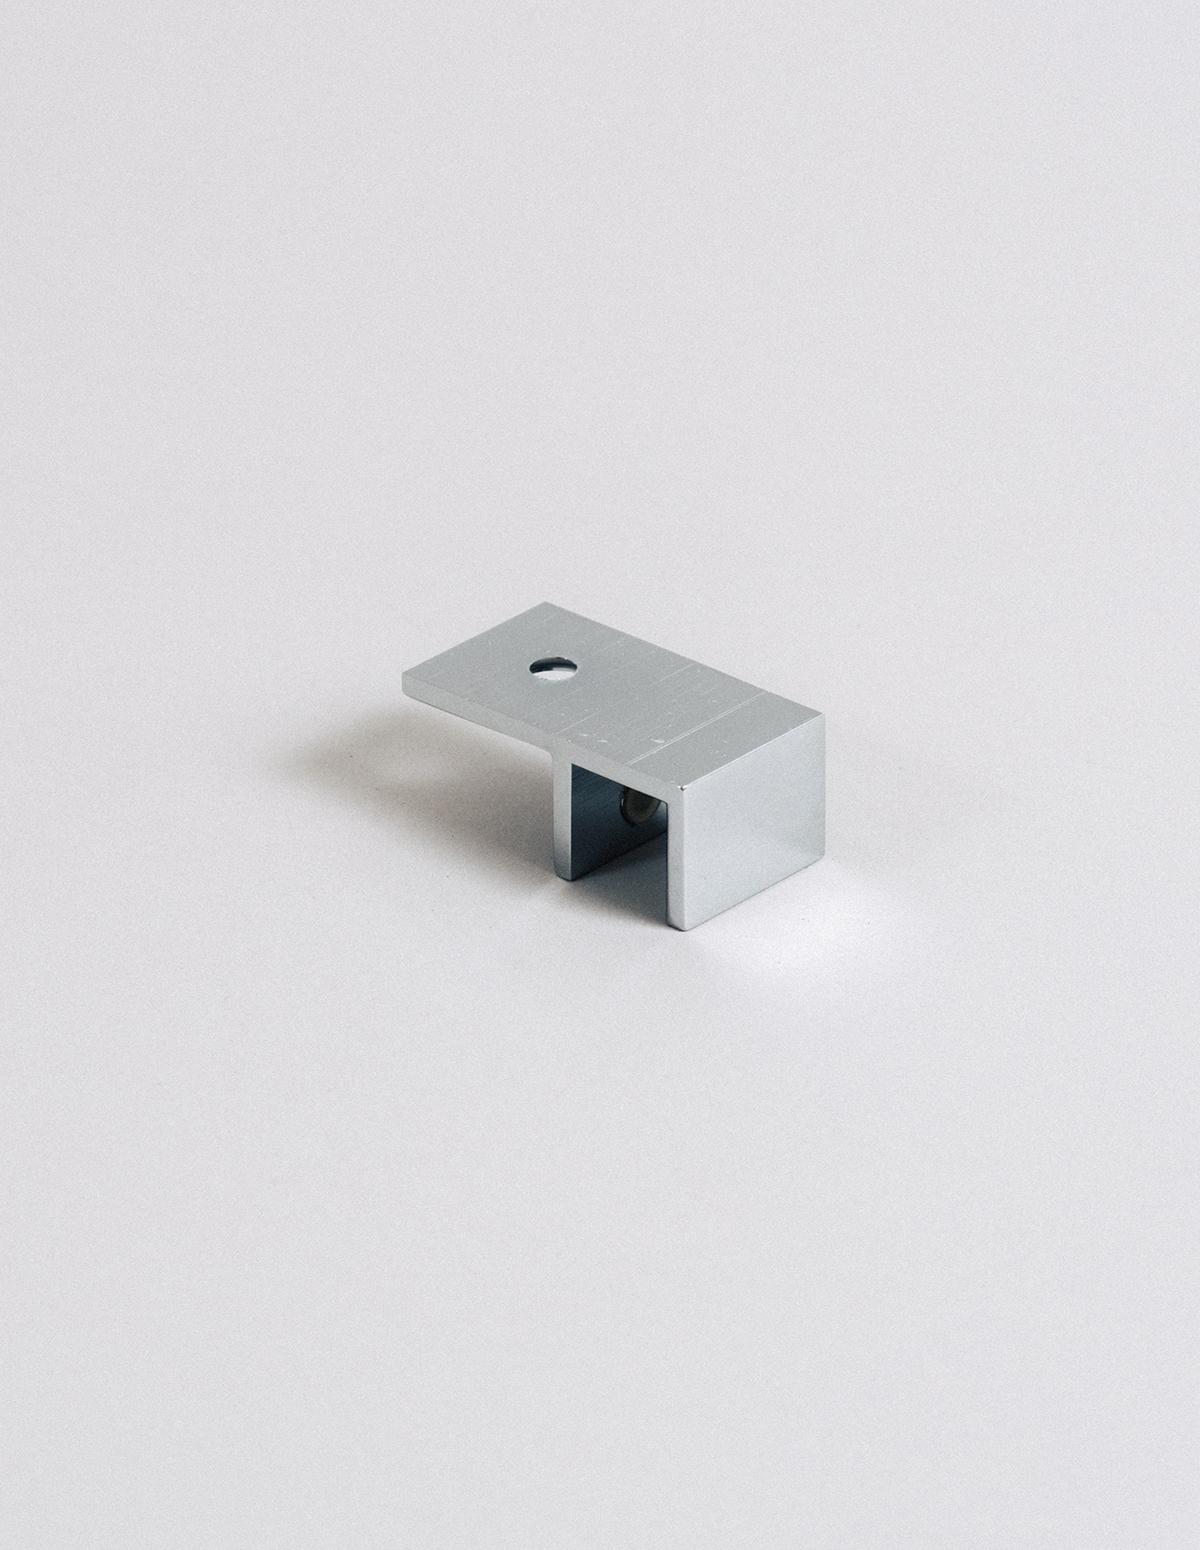 Optimum-Studios-Architectural-Glass-Metal-HardwarePage-GlassClip1-042216